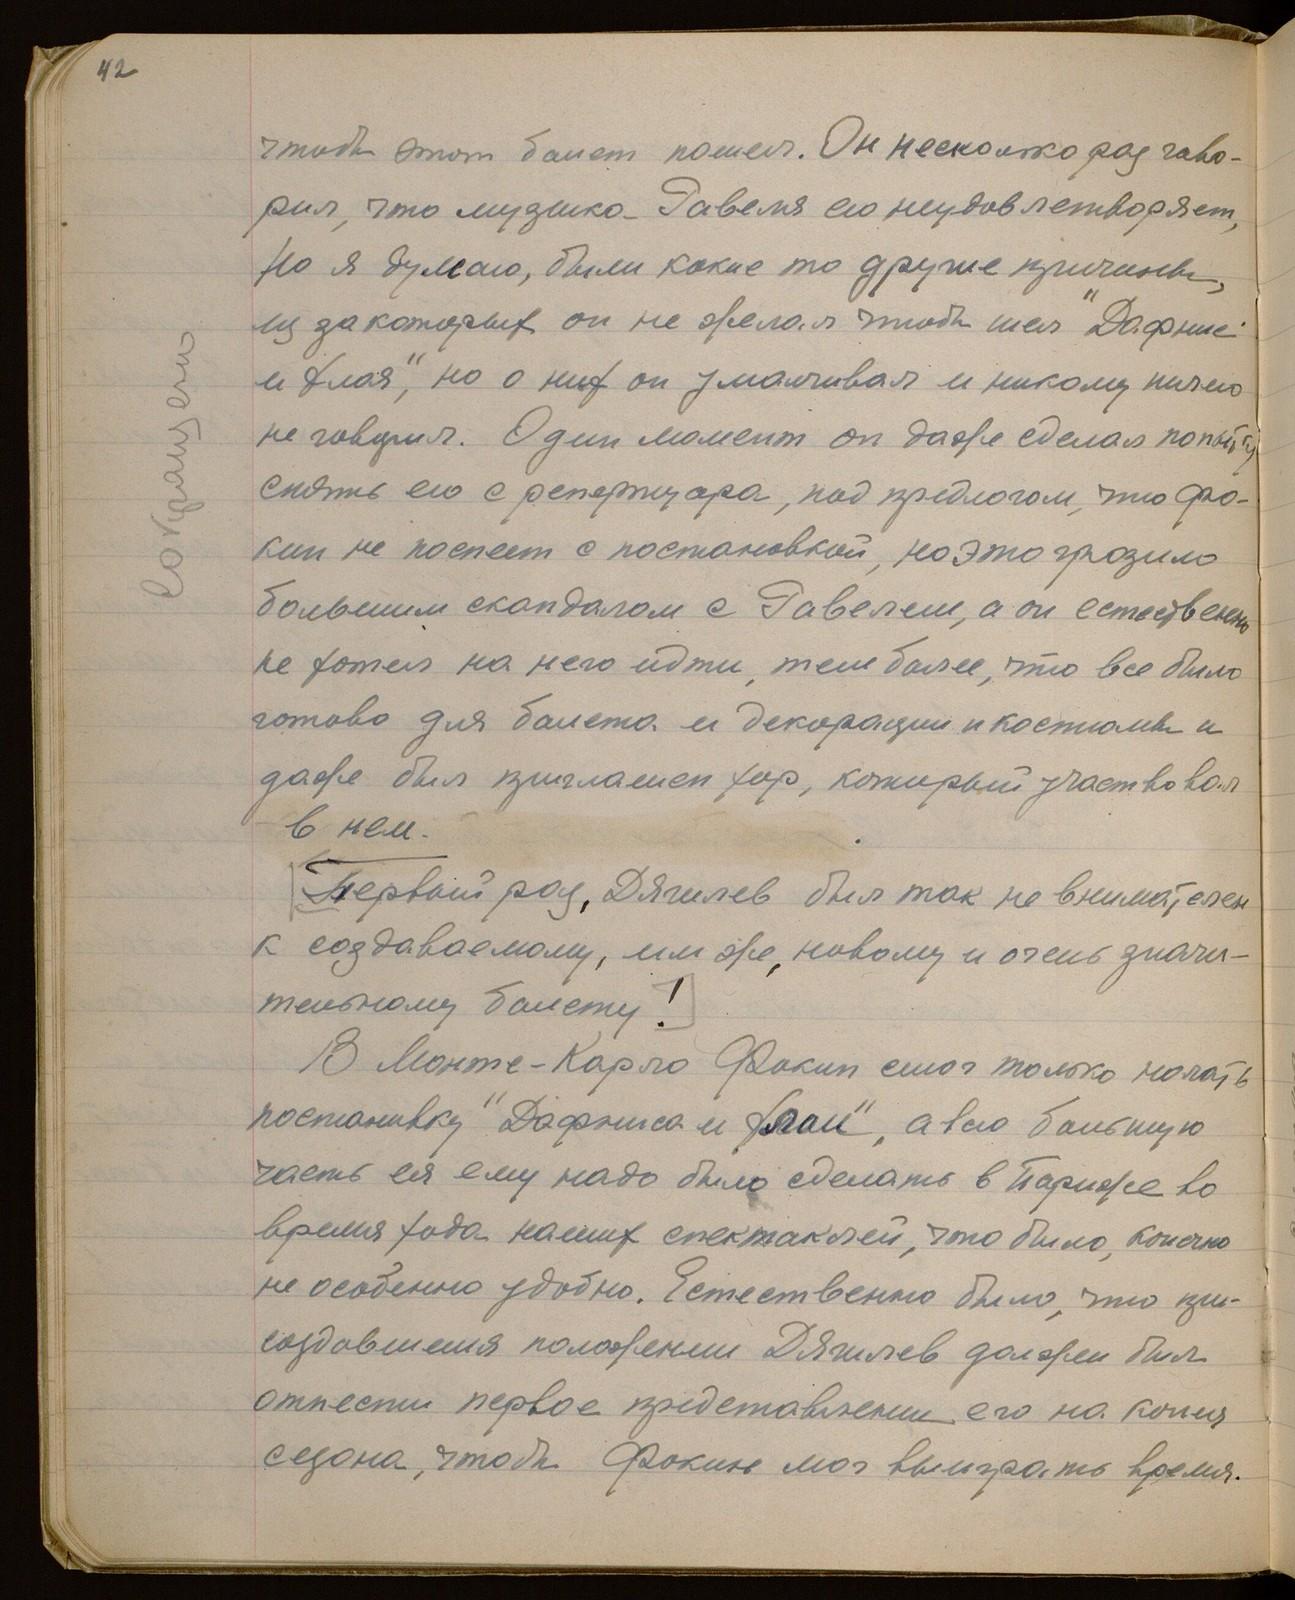 """ Tetrad'ka N.2 / prodolzhenie / S.P. Diagileva / I ego / 1909-1929. / (1911-1914) goda / S.L. Grigor'ev. (on title page.)"